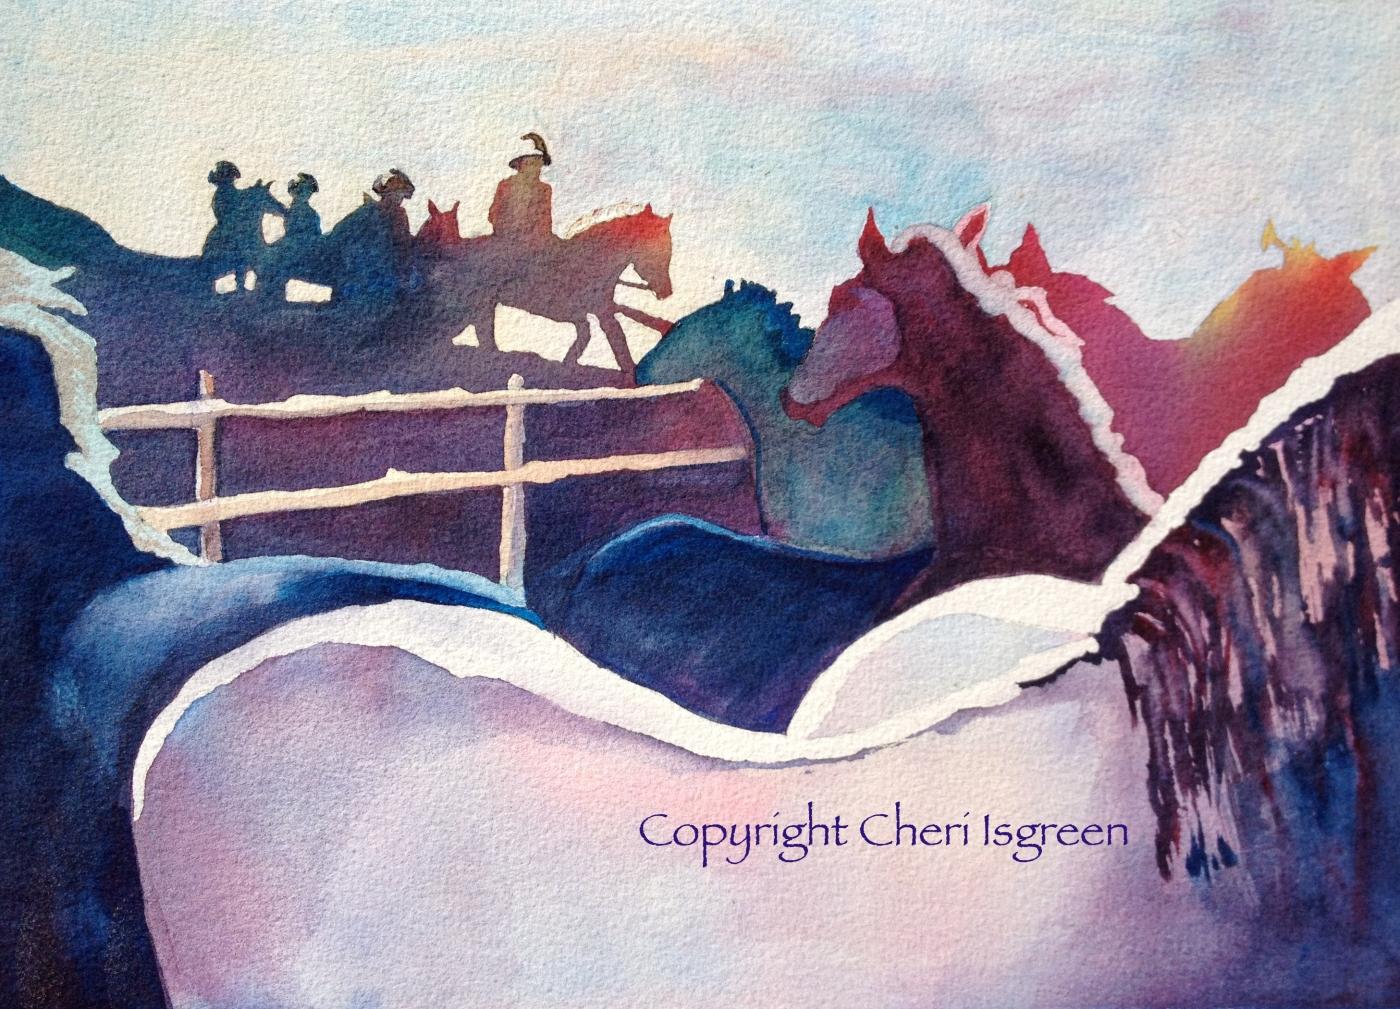 """Rescue, 1945"" copyright Cheri Isgreen, 2014"